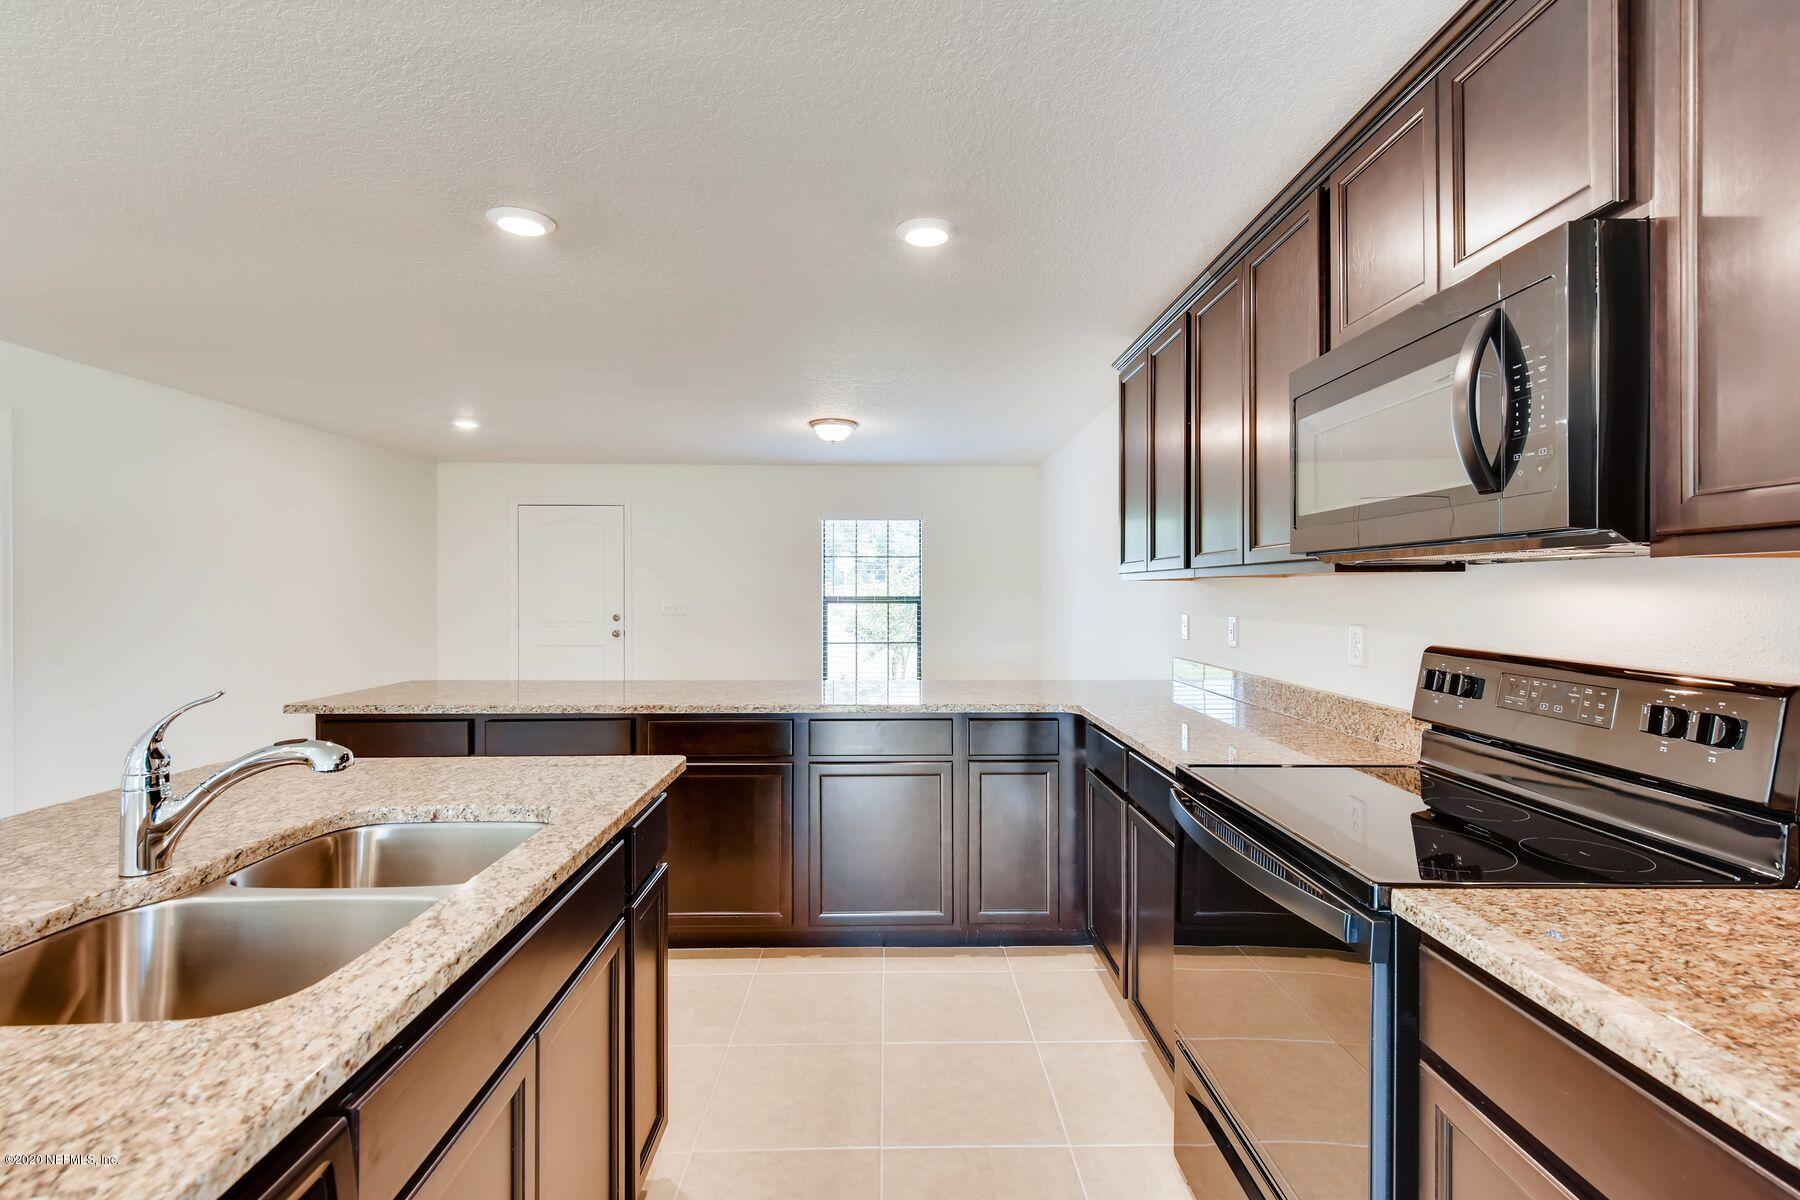 8653 LAKE GEORGE, MACCLENNY, FLORIDA 32063, 3 Bedrooms Bedrooms, ,2 BathroomsBathrooms,Residential,For sale,LAKE GEORGE,1058121